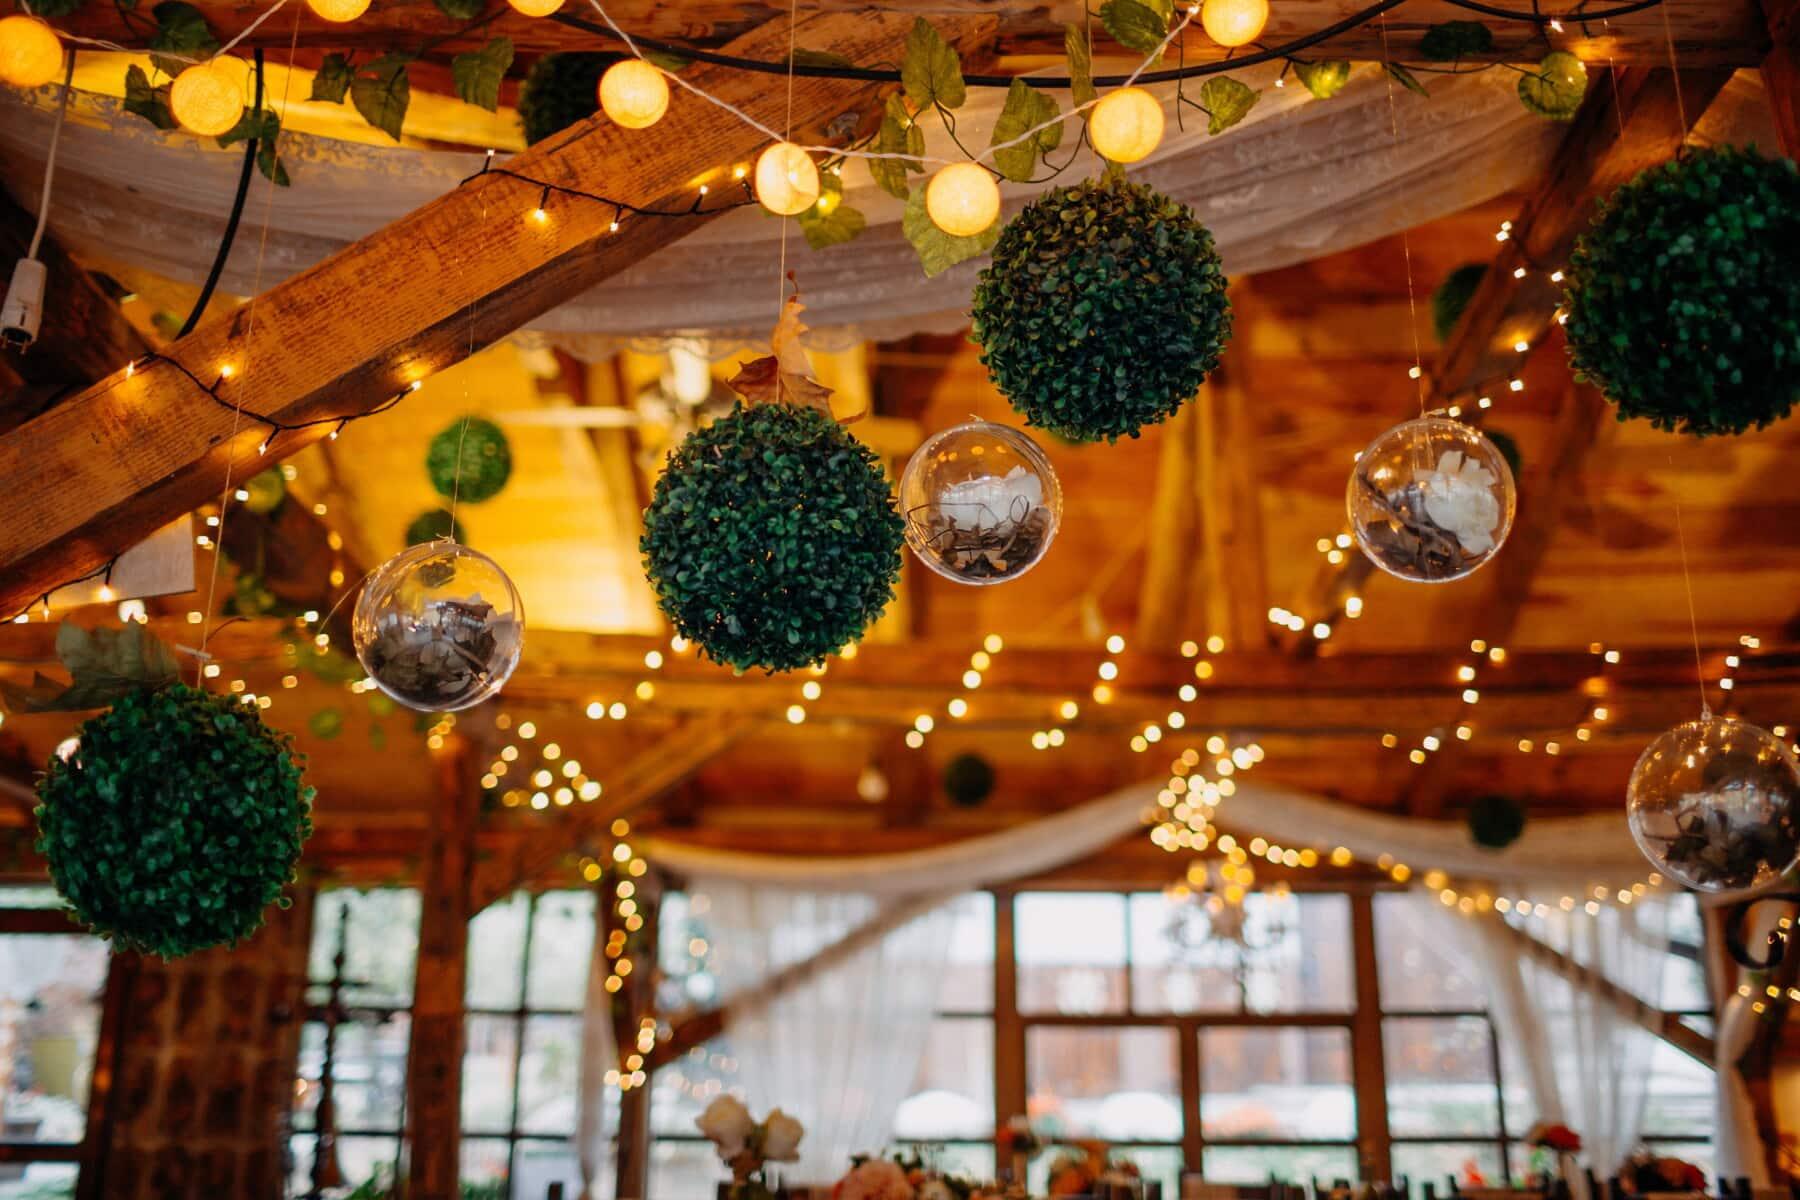 ornament, interior design, hanging, light bulb, lights, chandelier, indoors, light, luxury, vacation